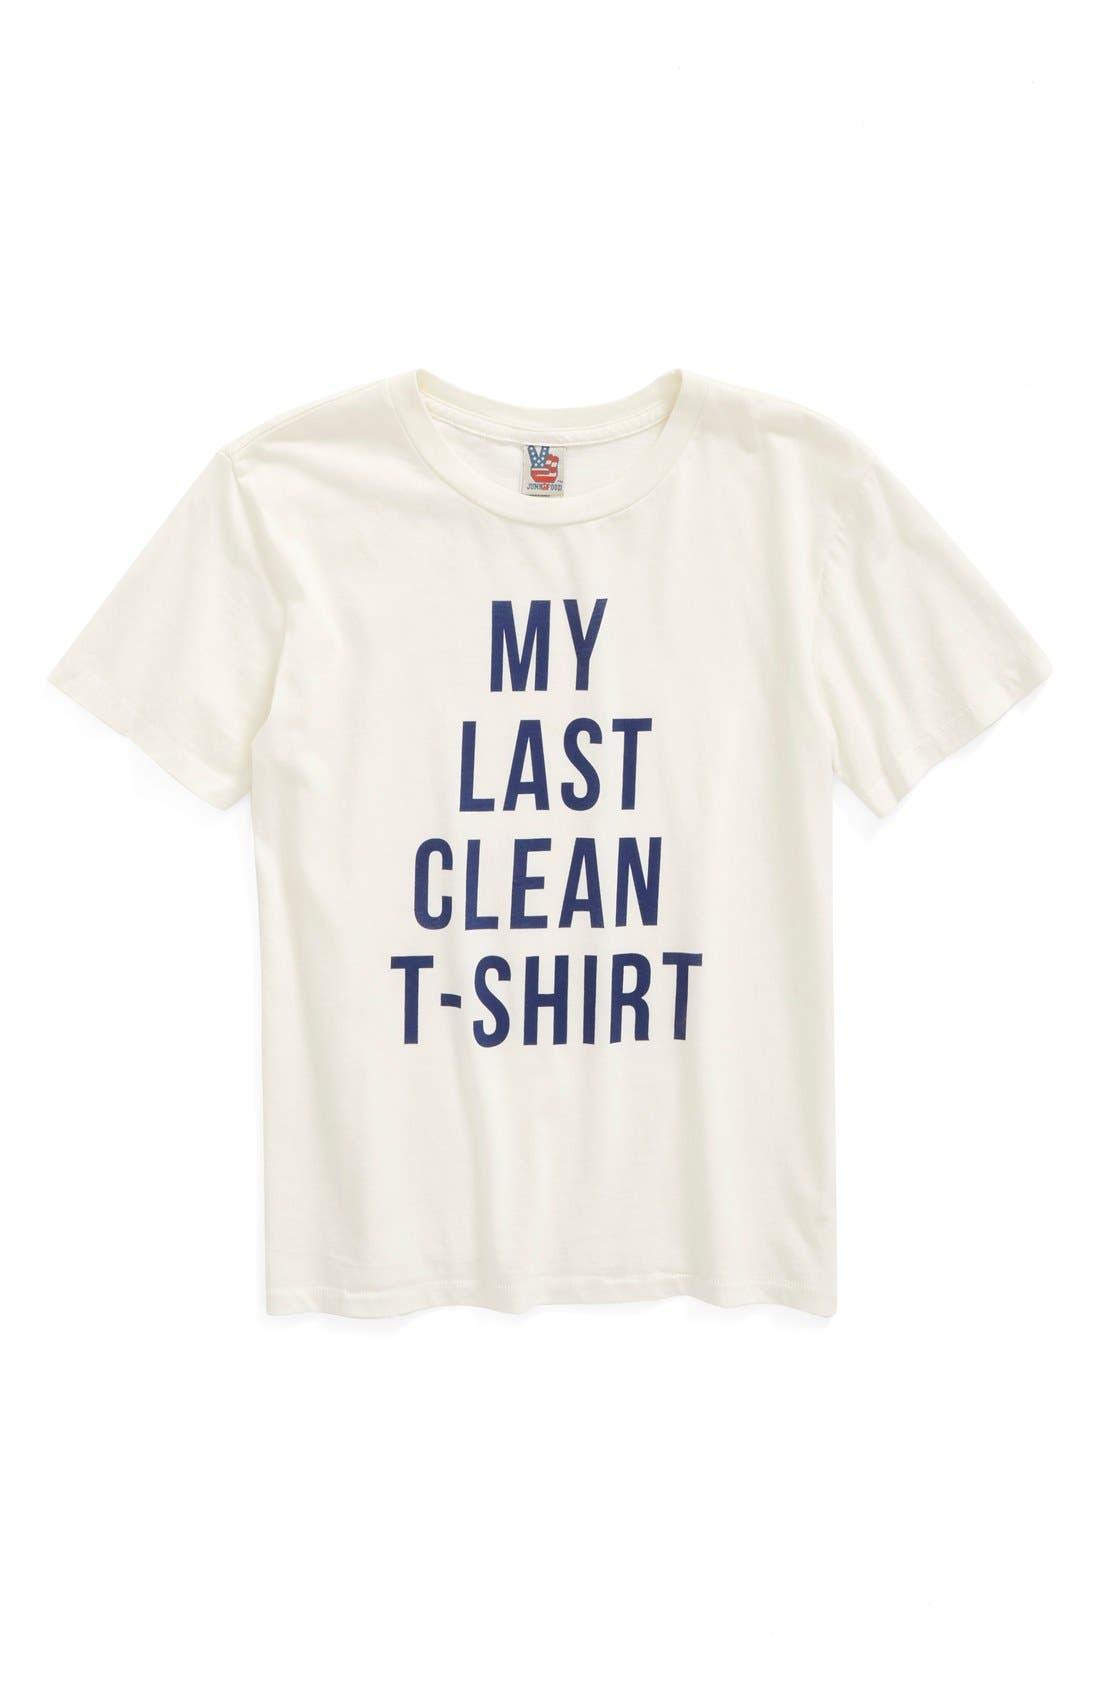 Alternate Image 1 Selected - Junk Food 'My Last Clean T-Shirt' Graphic T-Shirt (Big Boys)